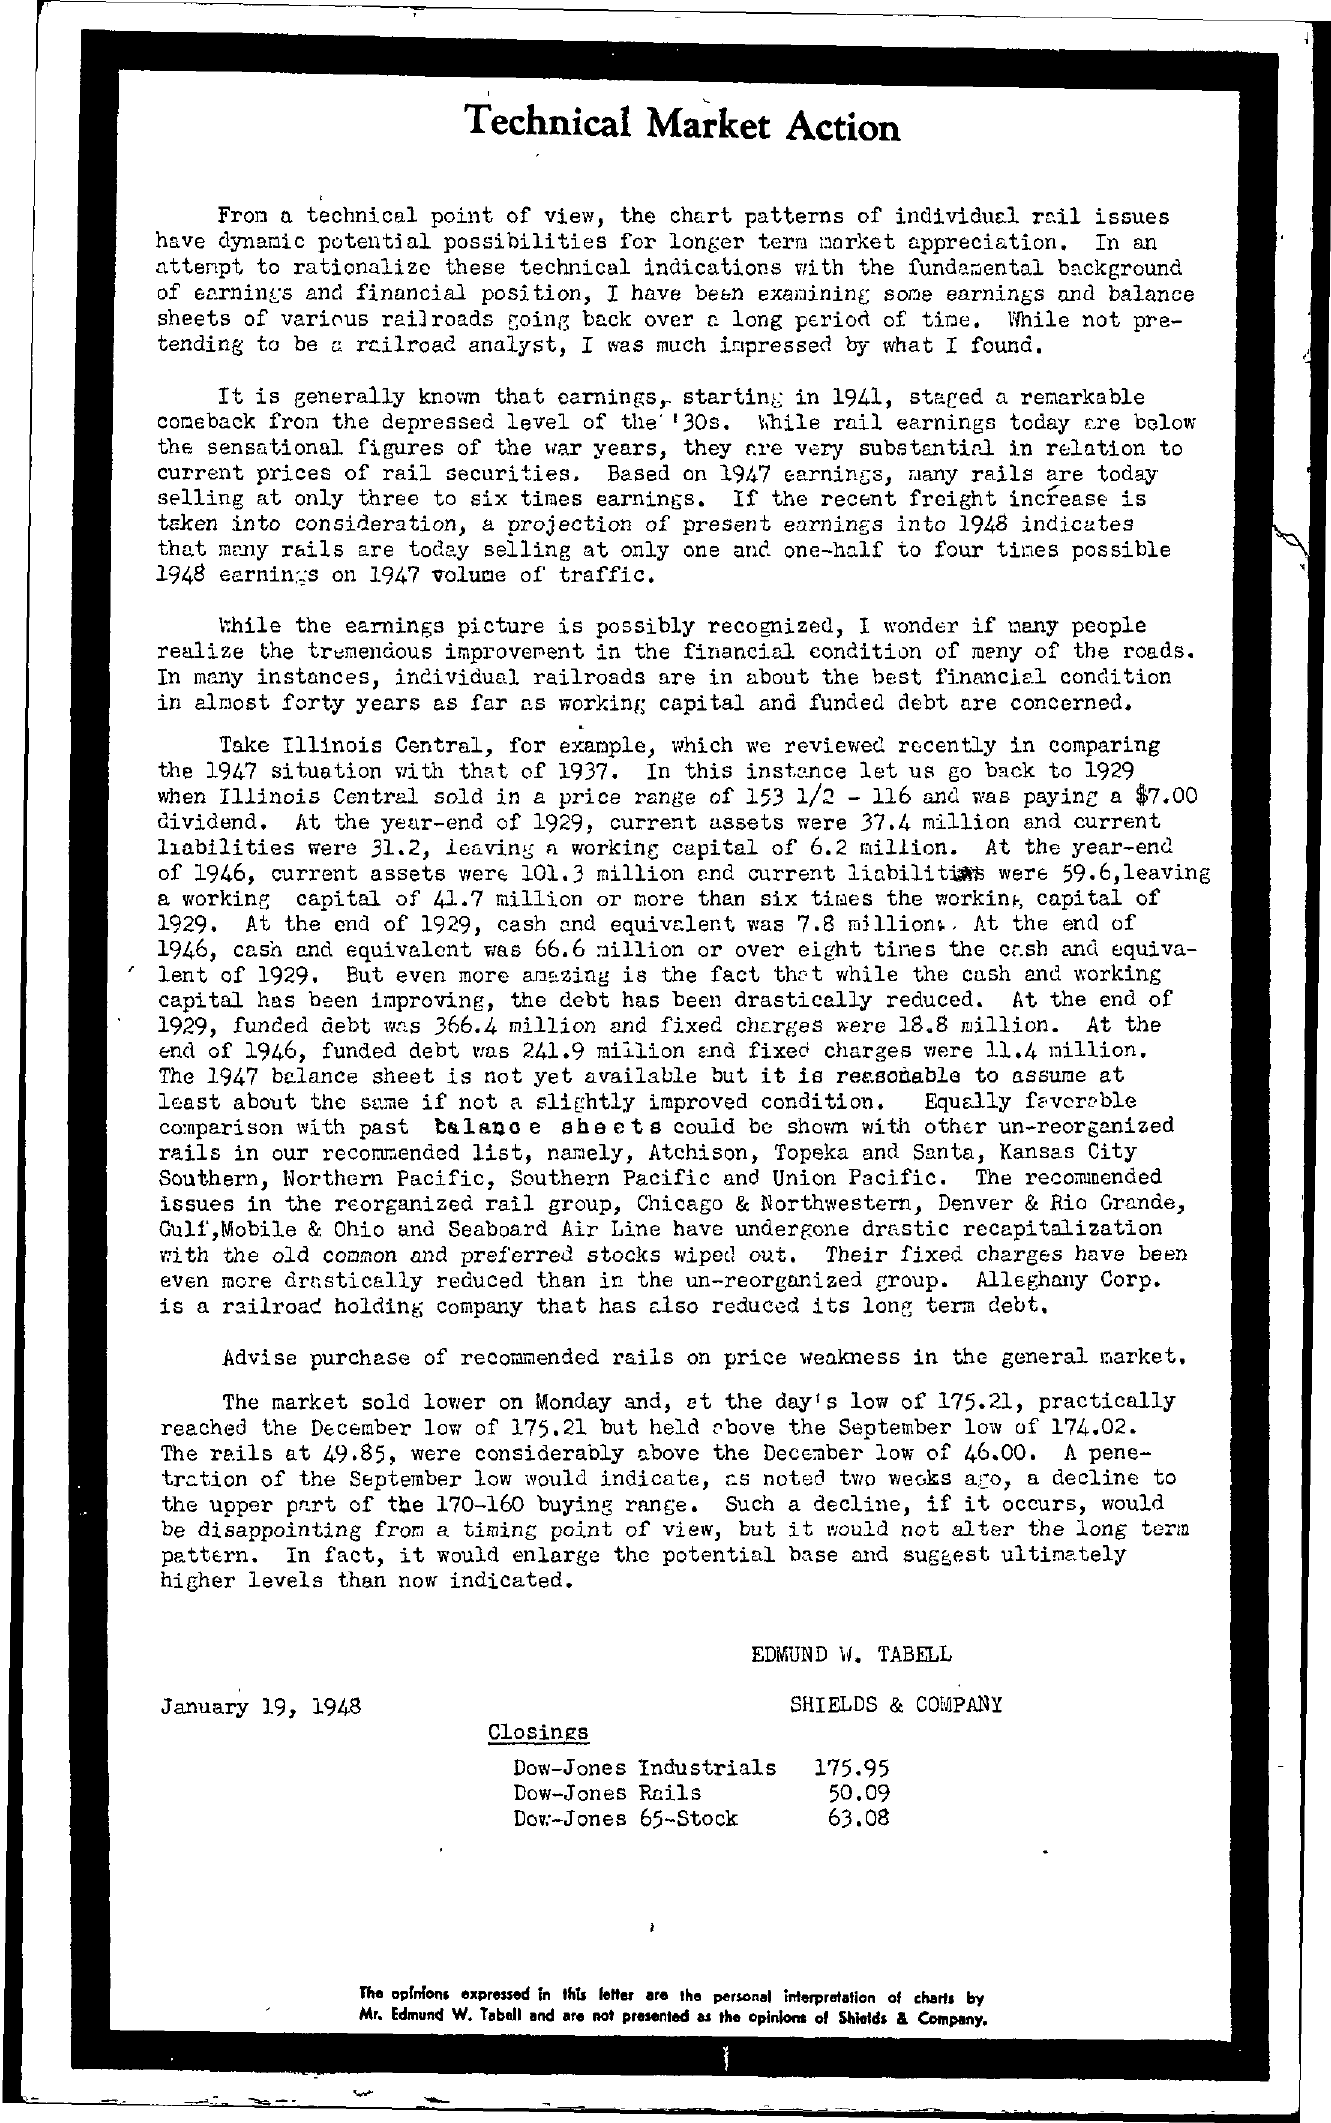 Tabell's Market Letter - January 19, 1948